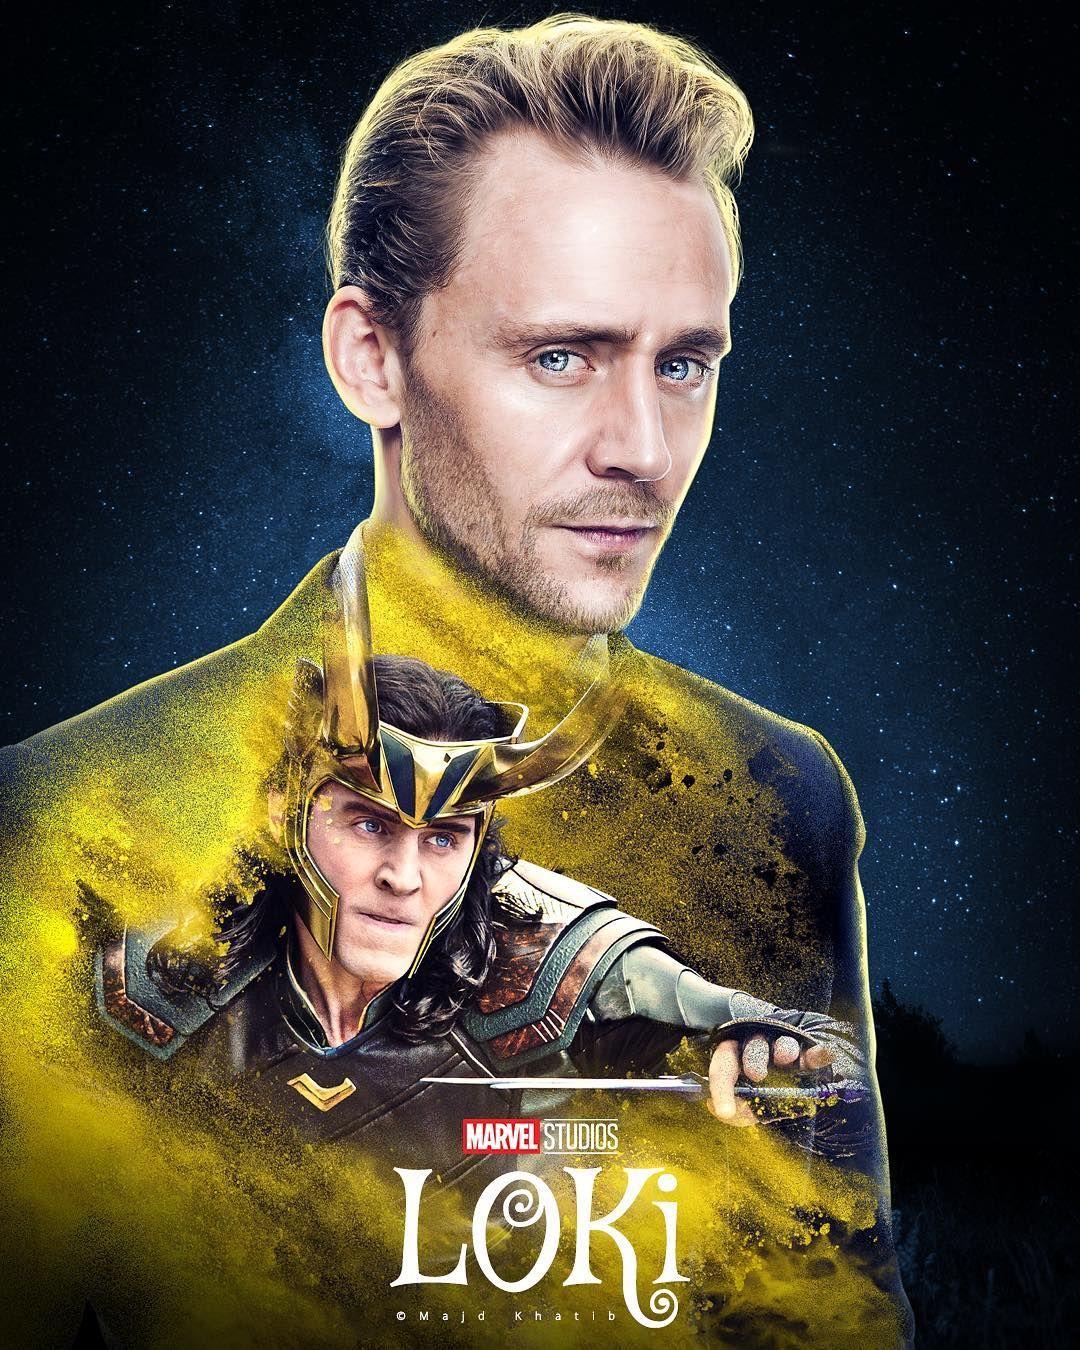 Another Design For Loki Majdkhatibart Graphicdesign Design Edit Manipulation Photoshop Retouching Adobe Loki Loki Poster Loki Wallpaper